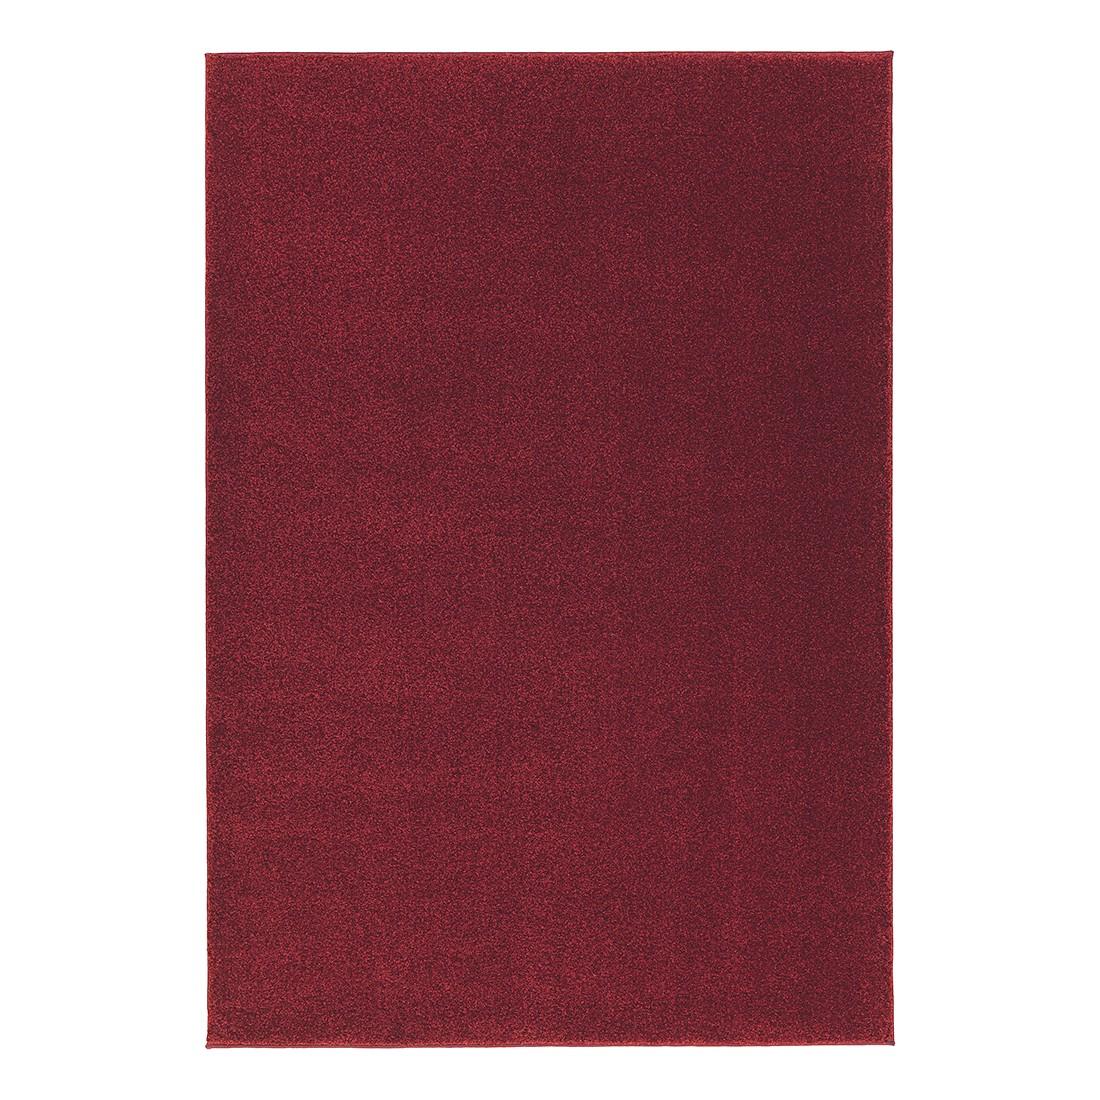 Teppich Samoa I – Rot – 67 x 130 cm, Astra jetzt bestellen